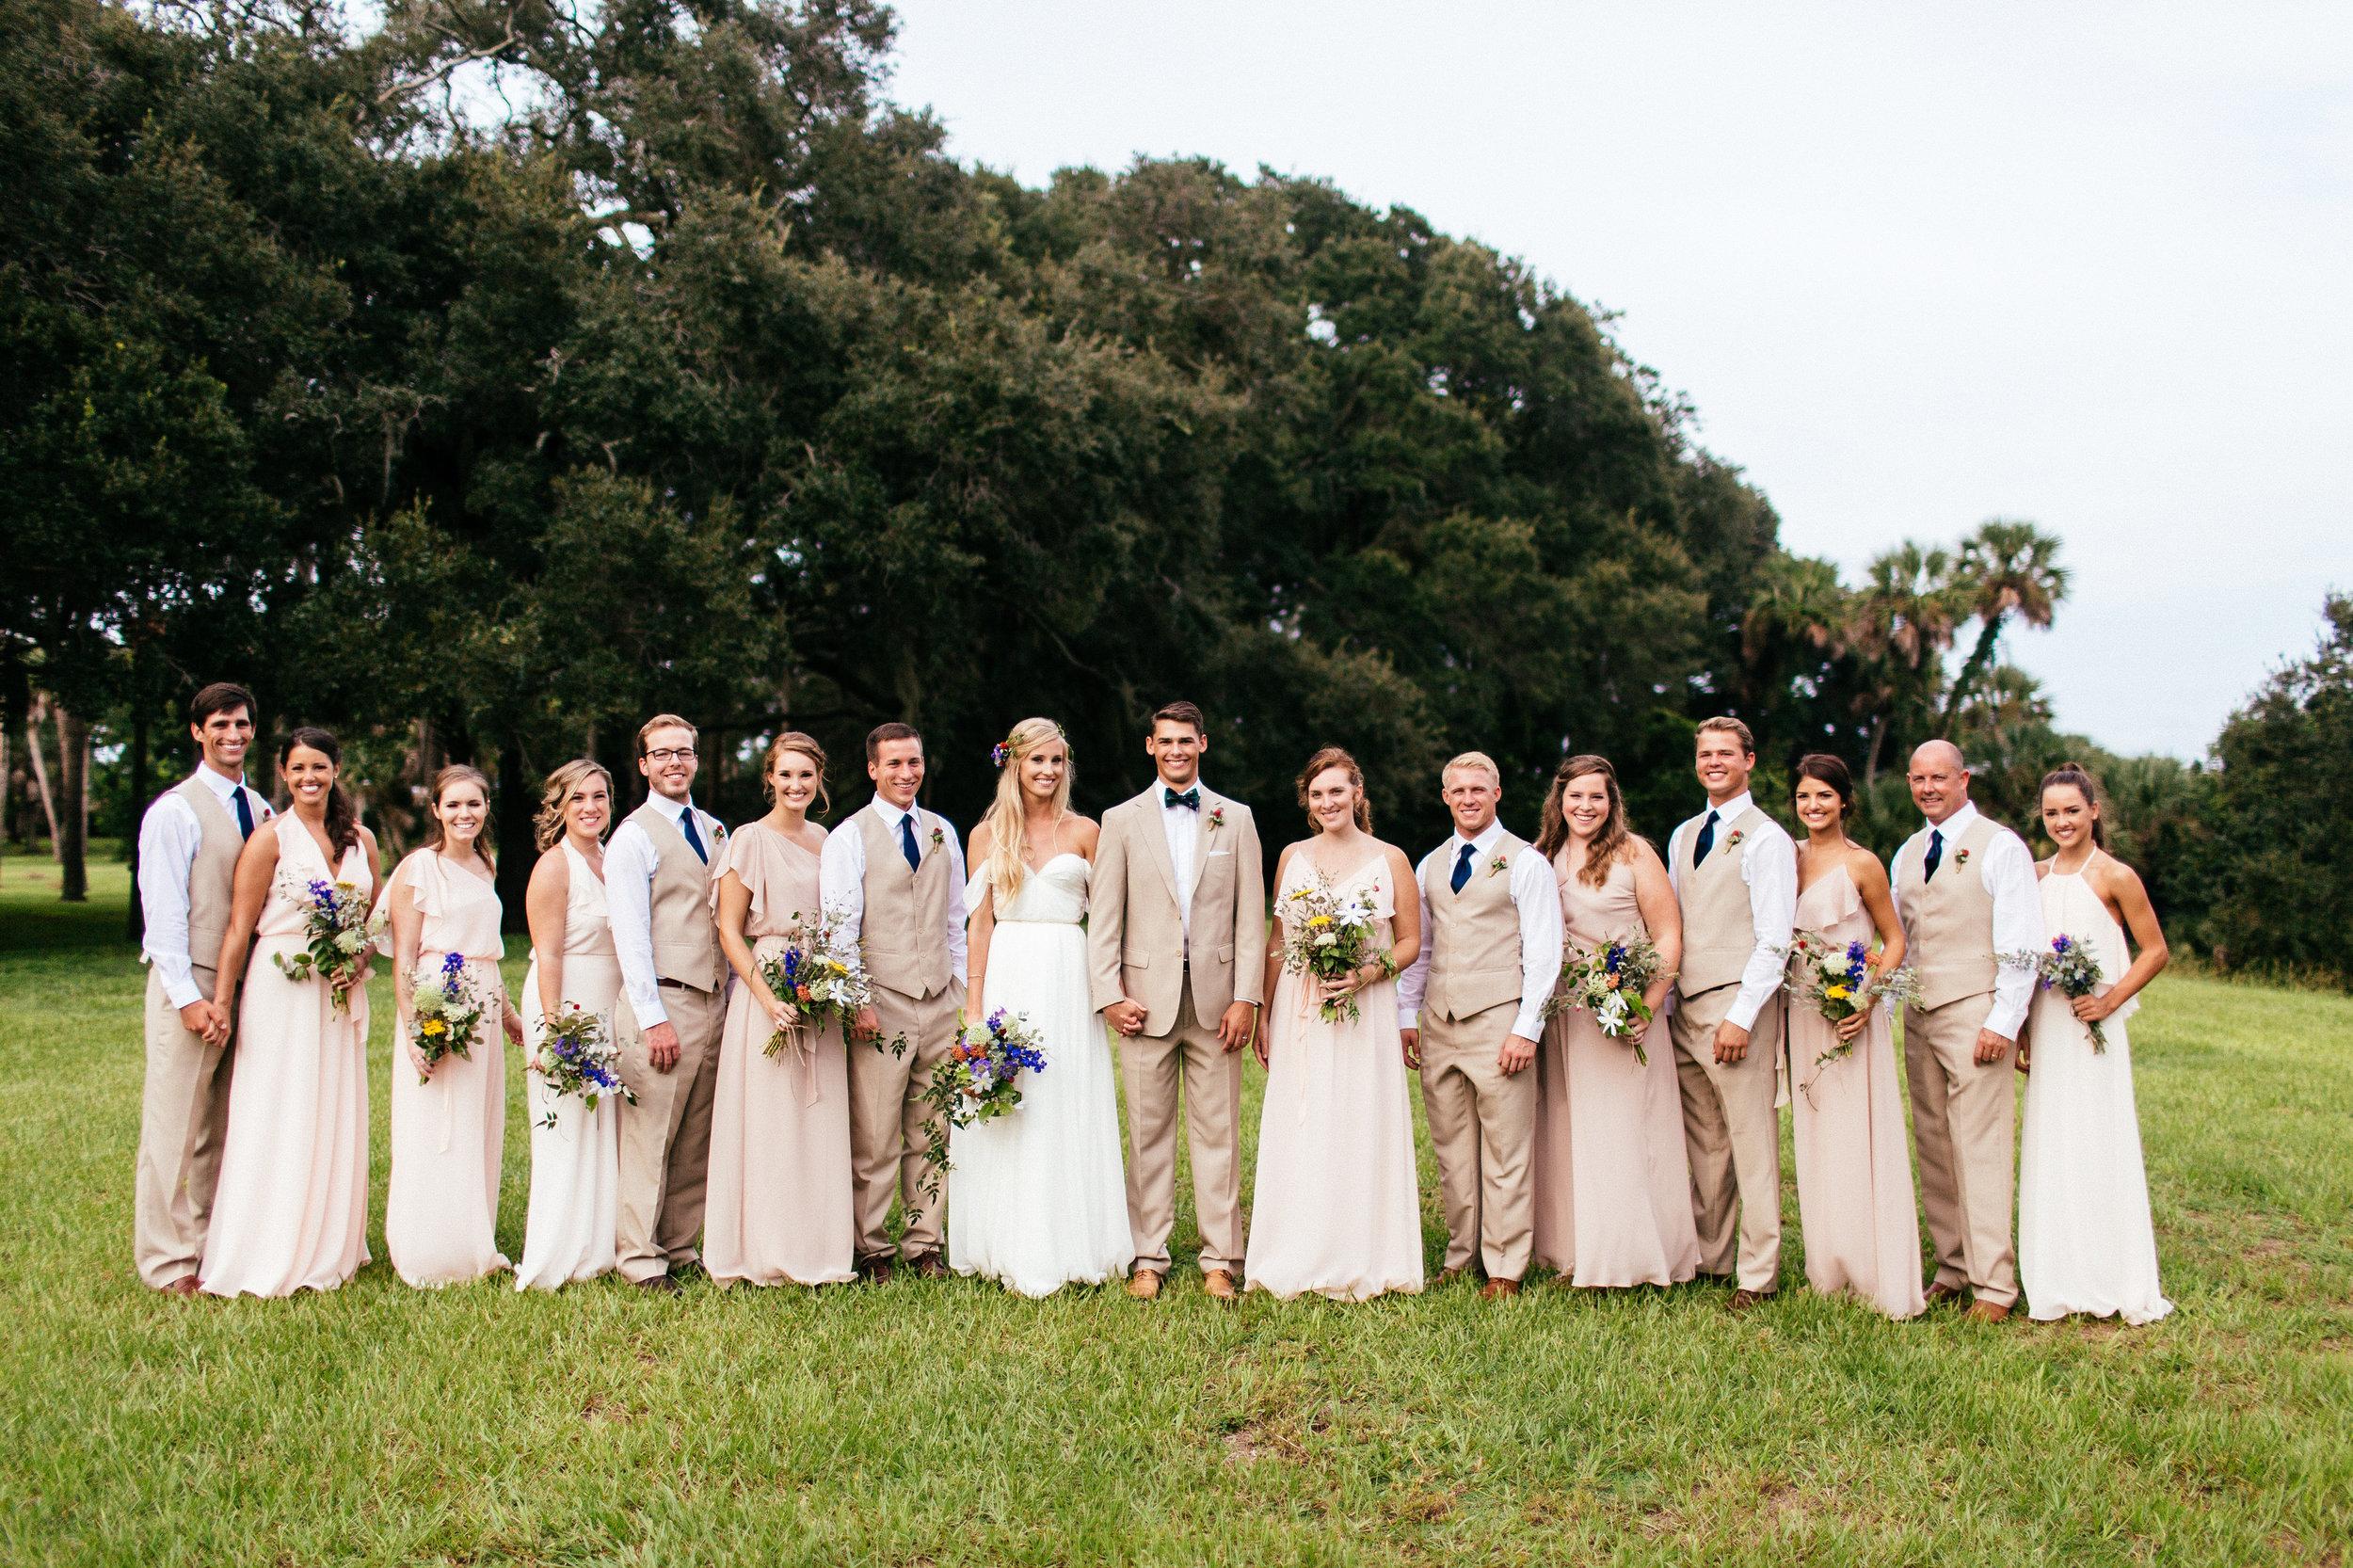 christina-karst-photography-ivory-and-beau-bridal-boutique-sarah-seven-lafayette-boho-bride-boho-bridal-boutique-indie-bridal-boutique-savannah-bridal-boutique-savannah-wedding-dresses-savannah-bridal-gowns-18.jpg